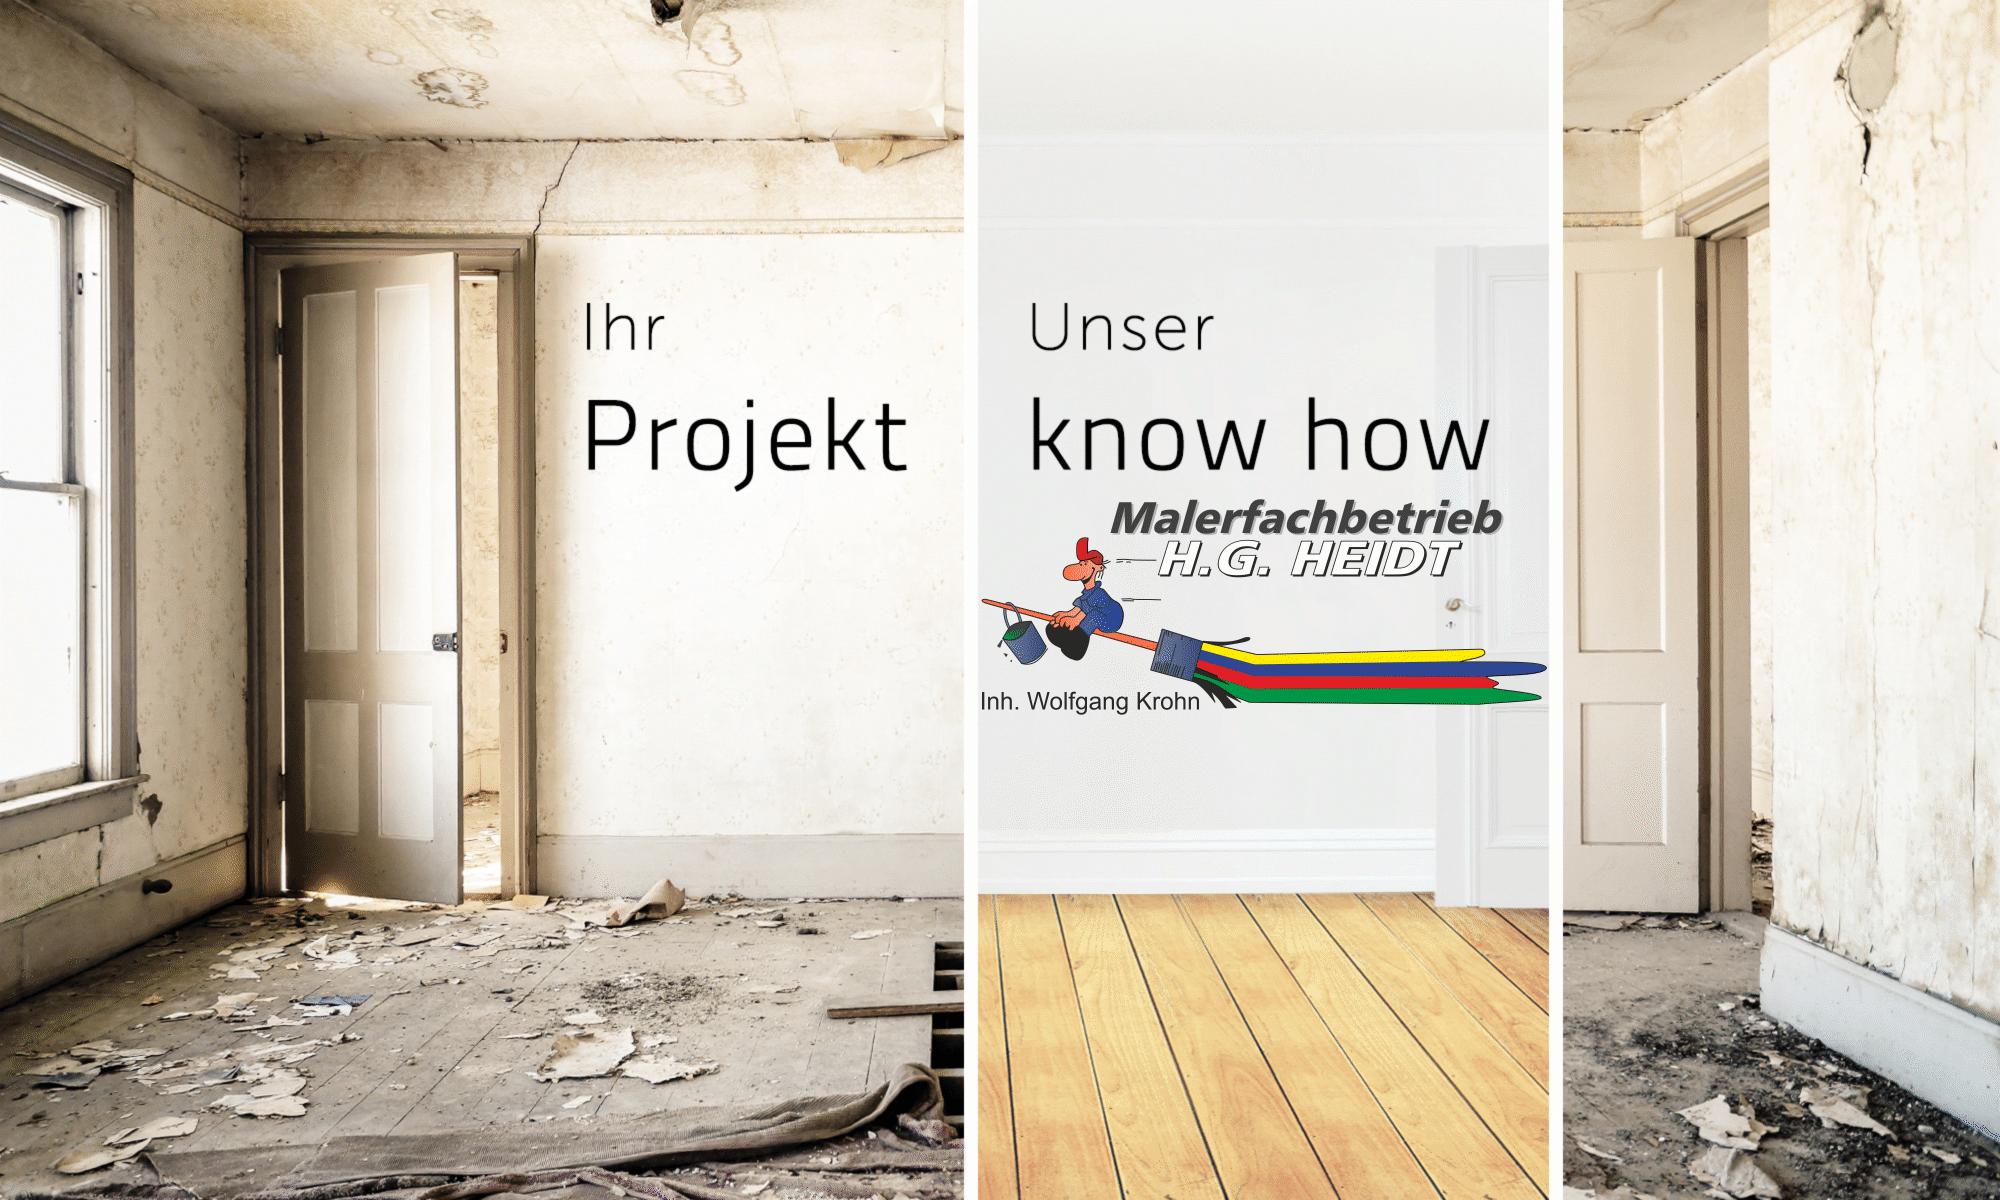 Malerfachbetrieb-Heidt.de